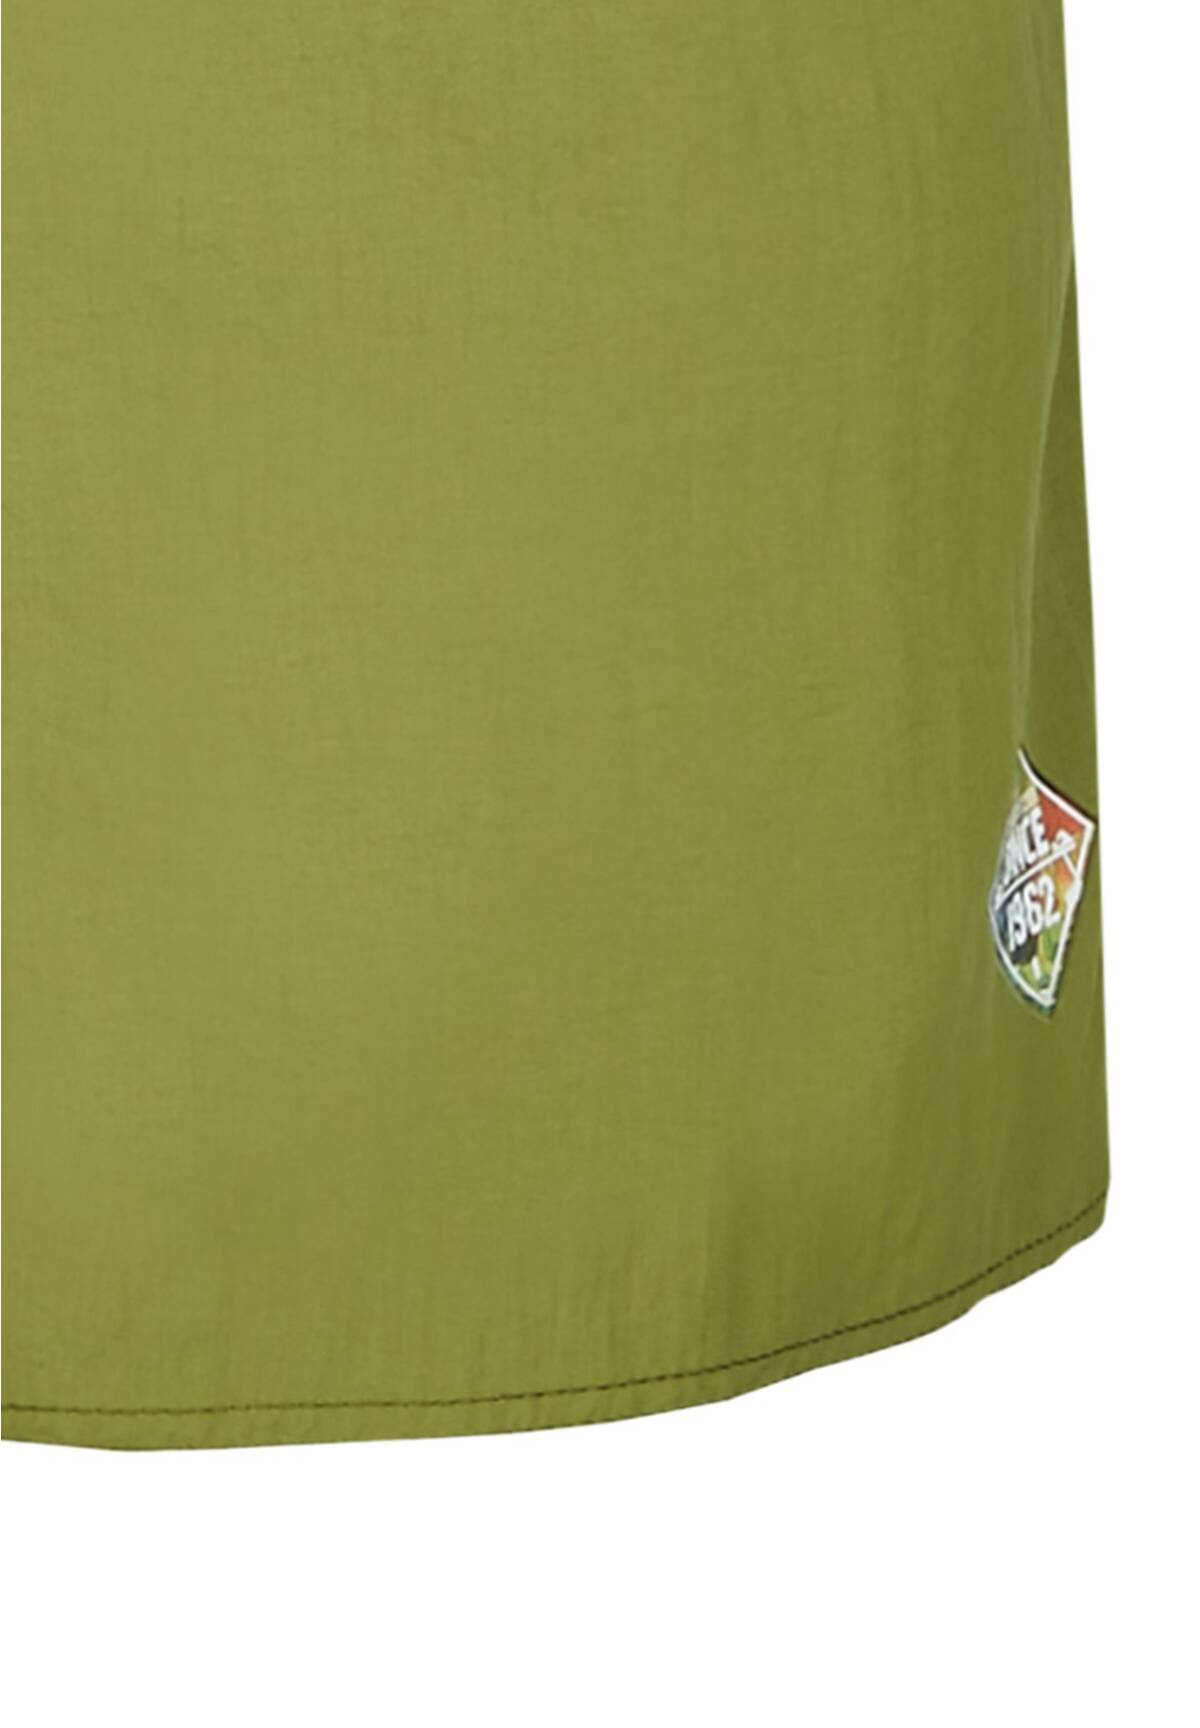 Badehose aus hochwertigem Dry Fit Material / BADESHORT GARIBALDI